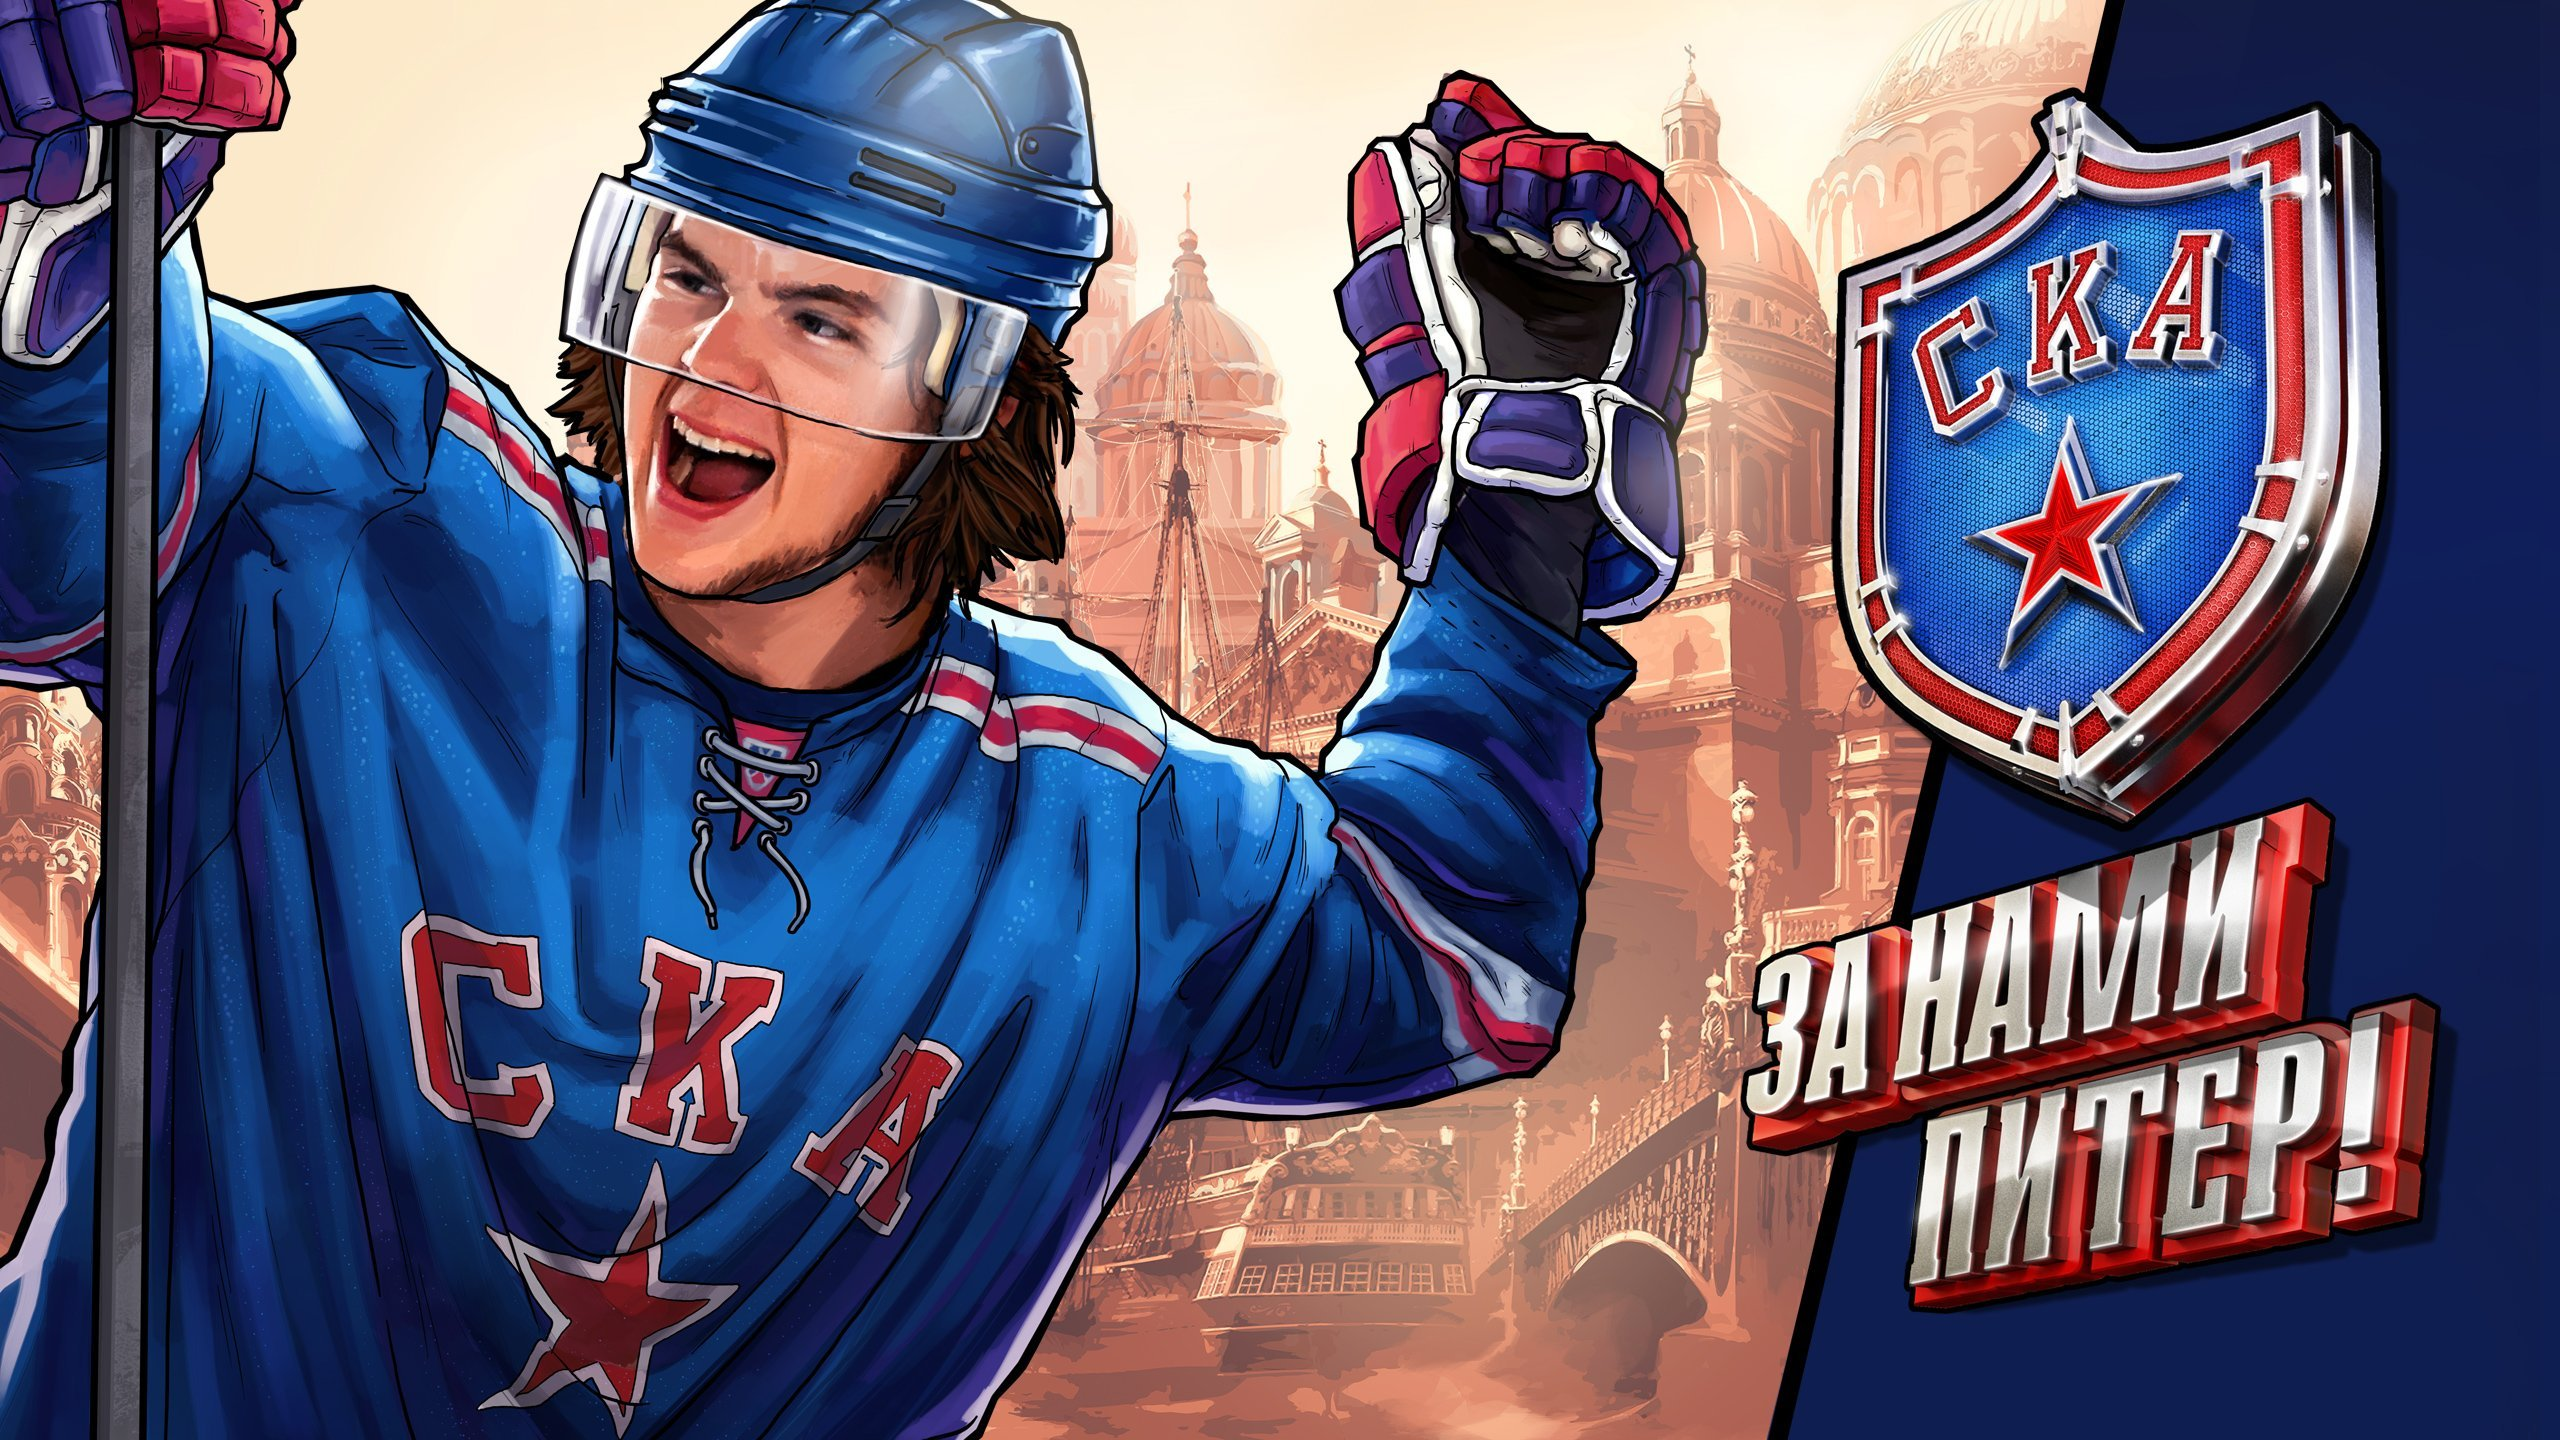 8 Сентября, ставки на КХЛ, где делать ставки на КХЛ